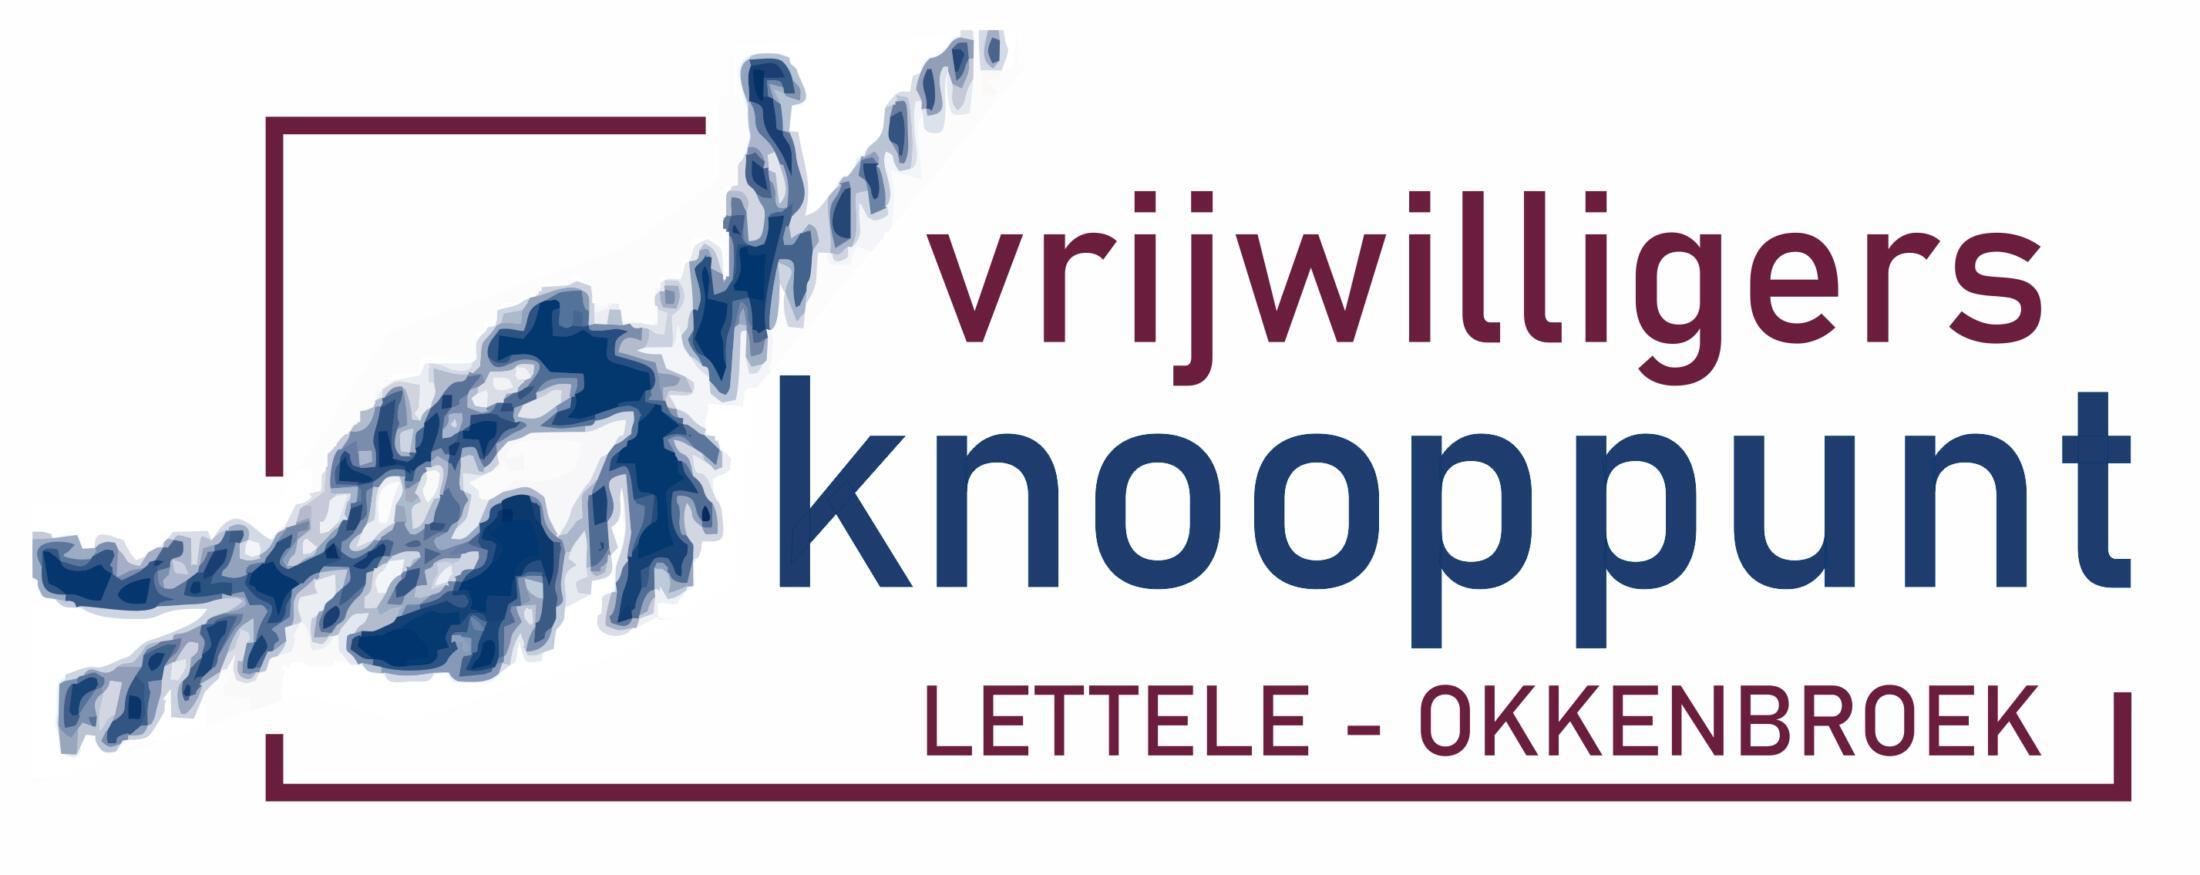 1 logo Vrijwilligers Knooppunt L-O